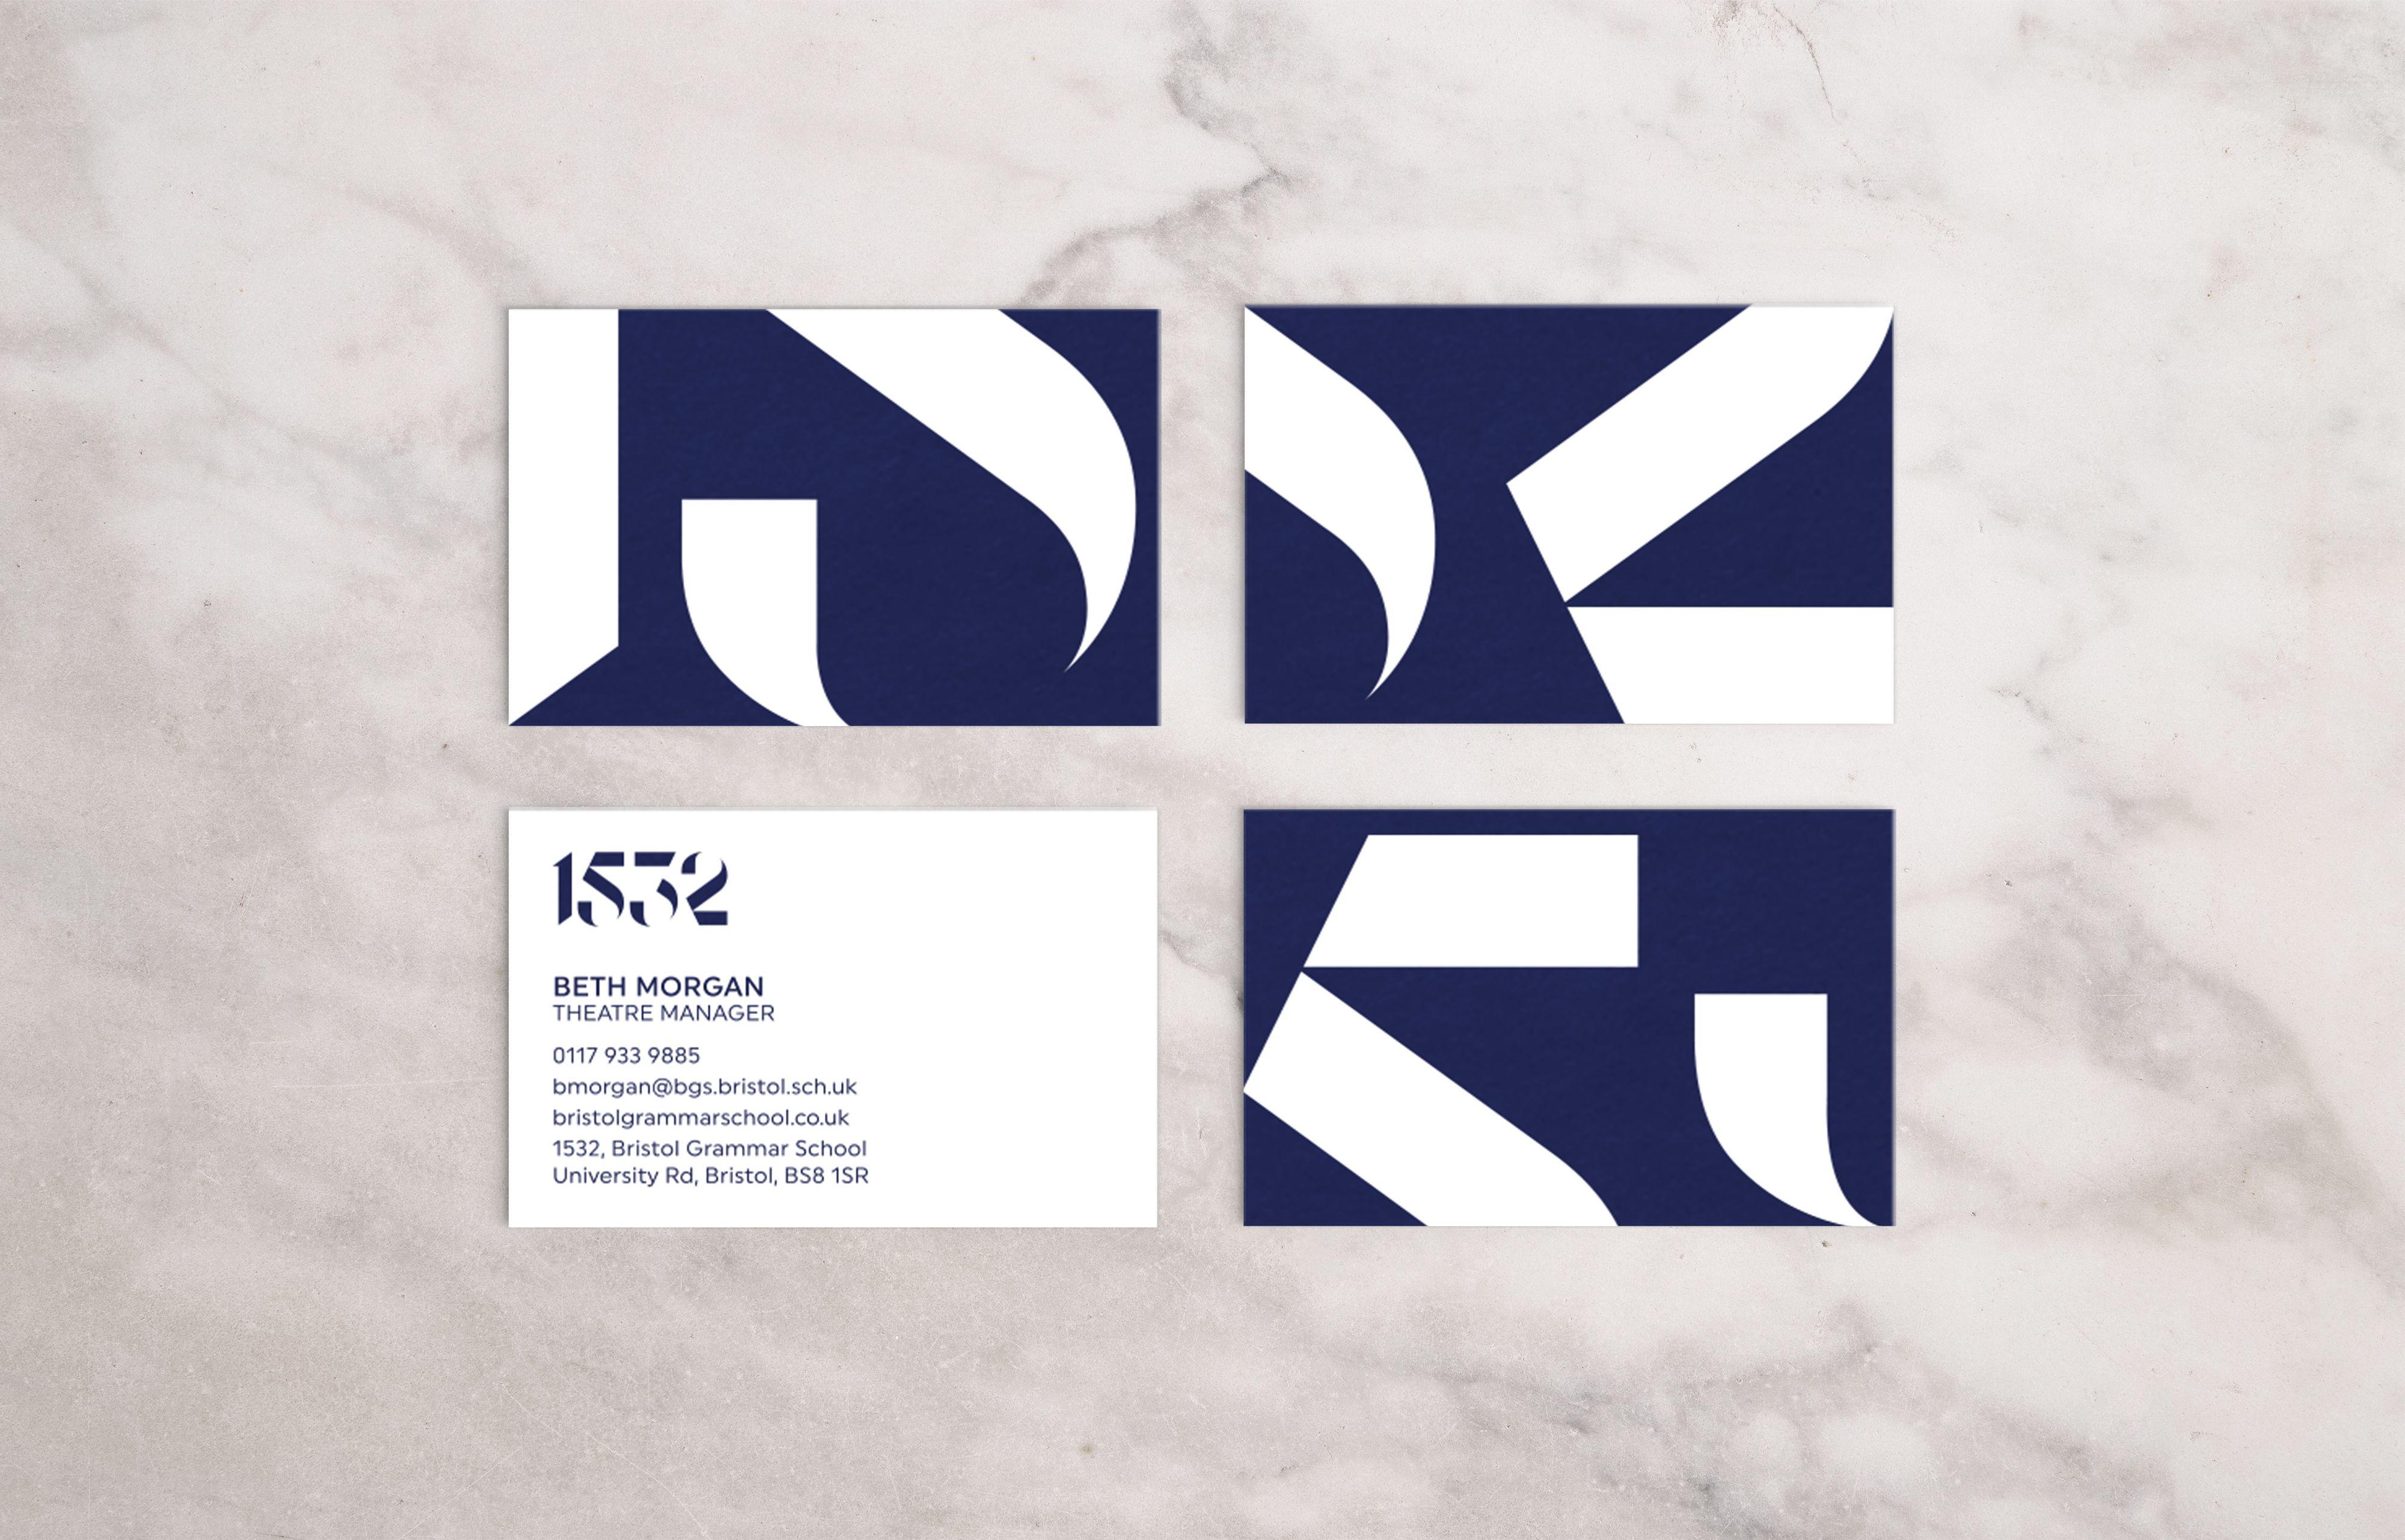 Bgs Bc Master Business Card Design Museum Identity Design